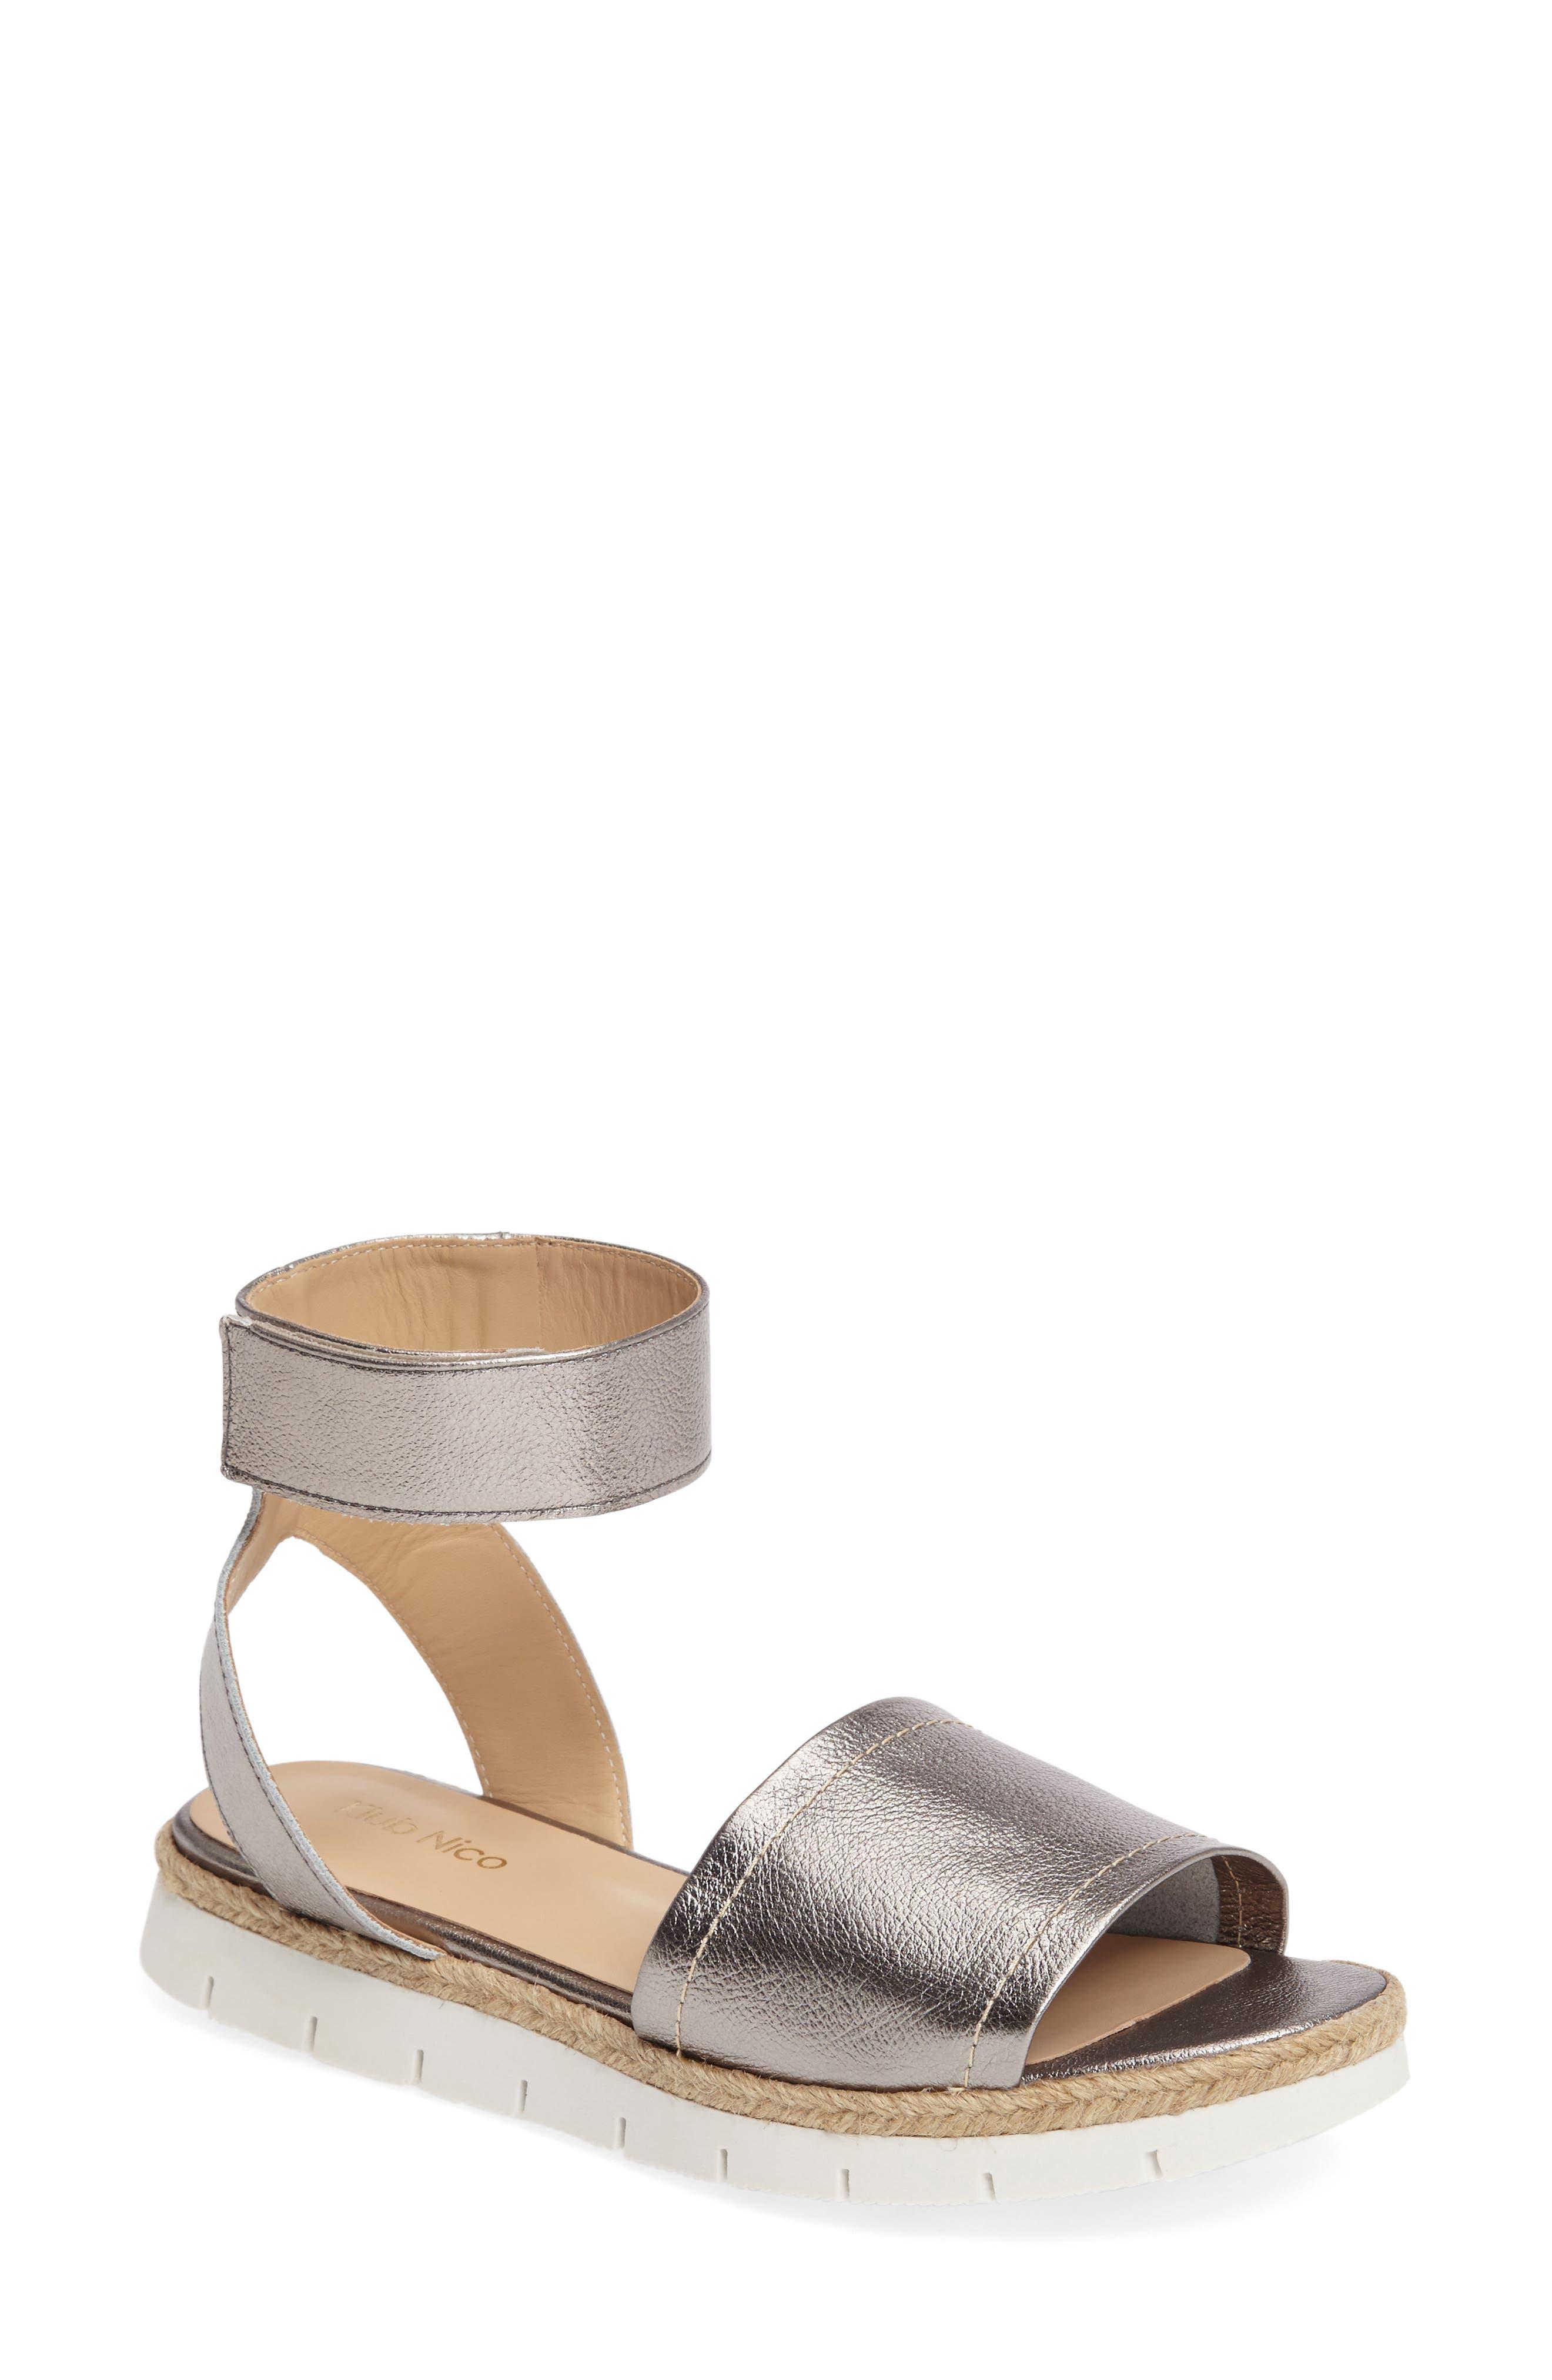 Cleo Platform Sandal,                             Main thumbnail 1, color,